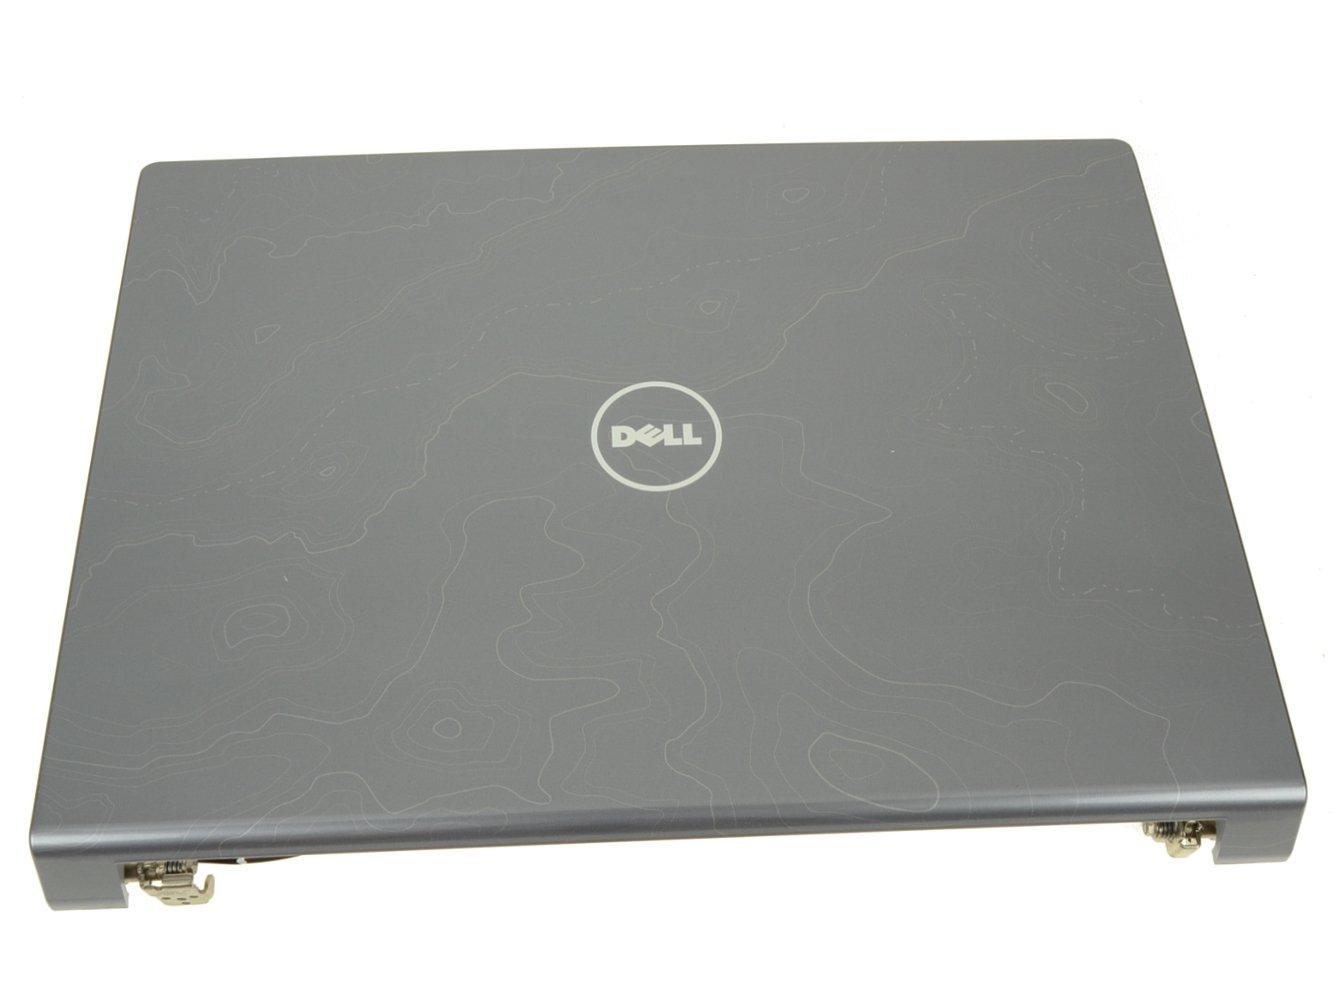 Amazon.com: Dell Studio 1735 1737 LCD Back Cover Lid Plastic - N263C:  Computers & Accessories